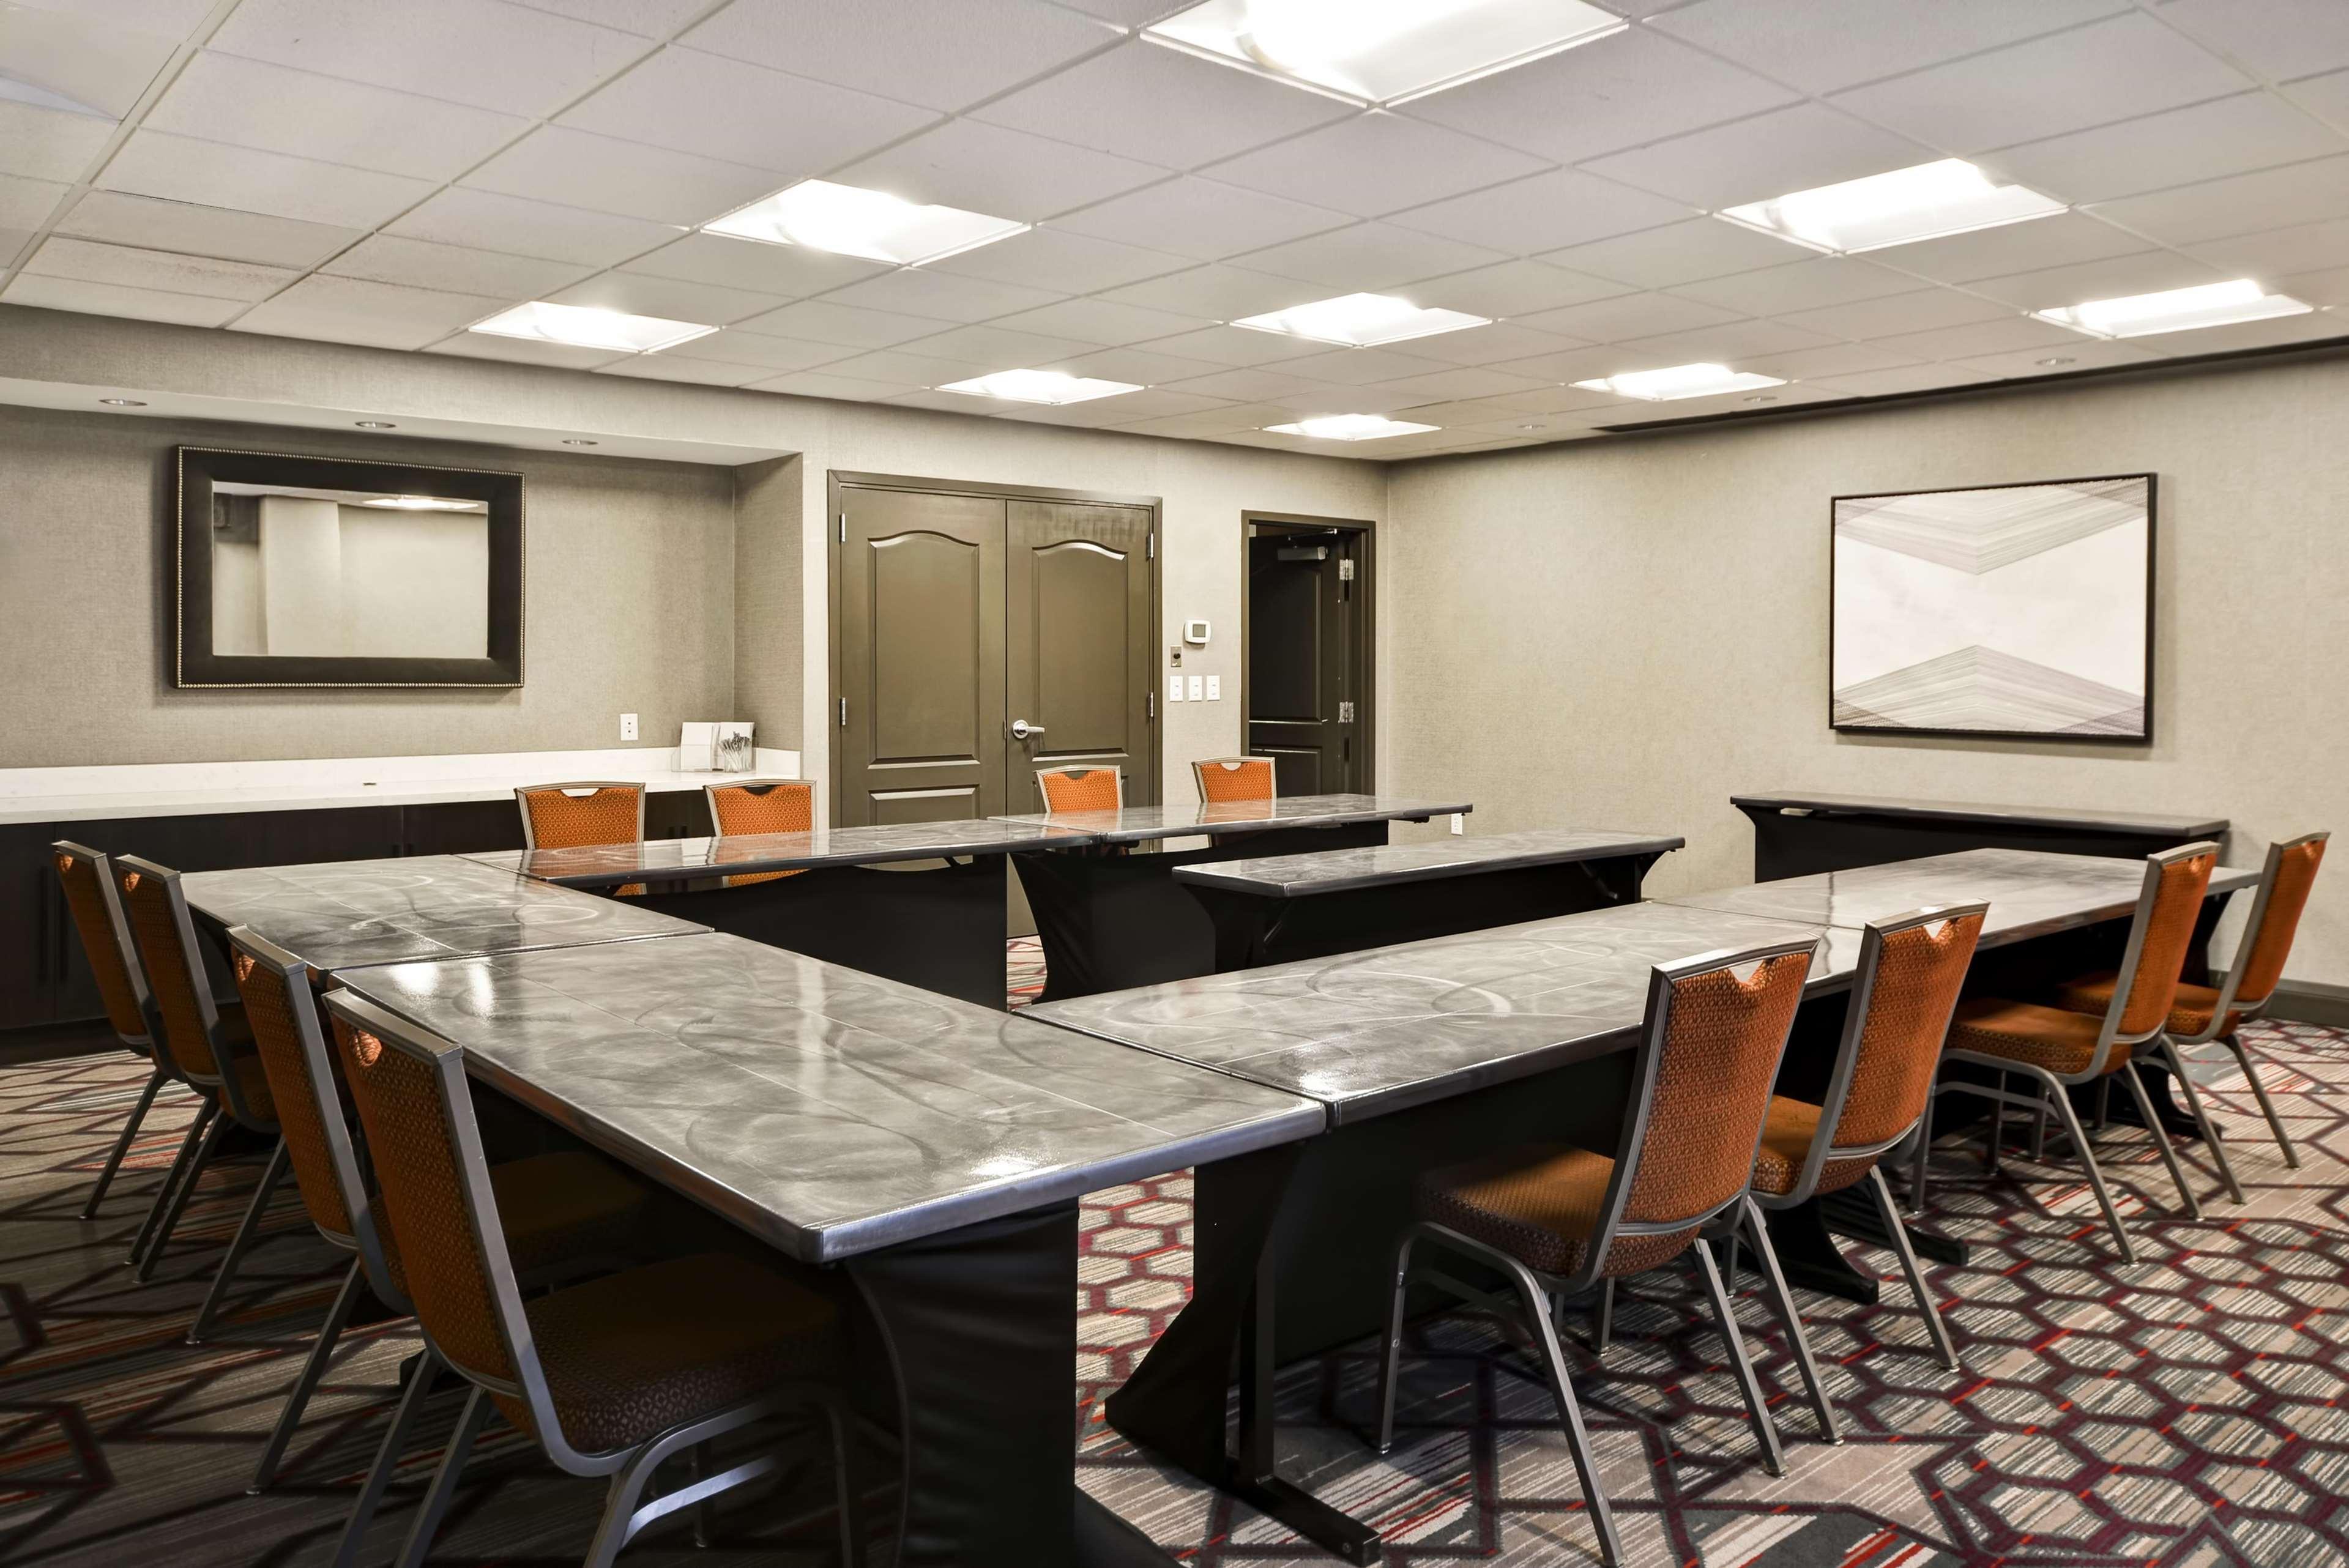 Hampton Inn & Suites Columbus-Easton Area image 60